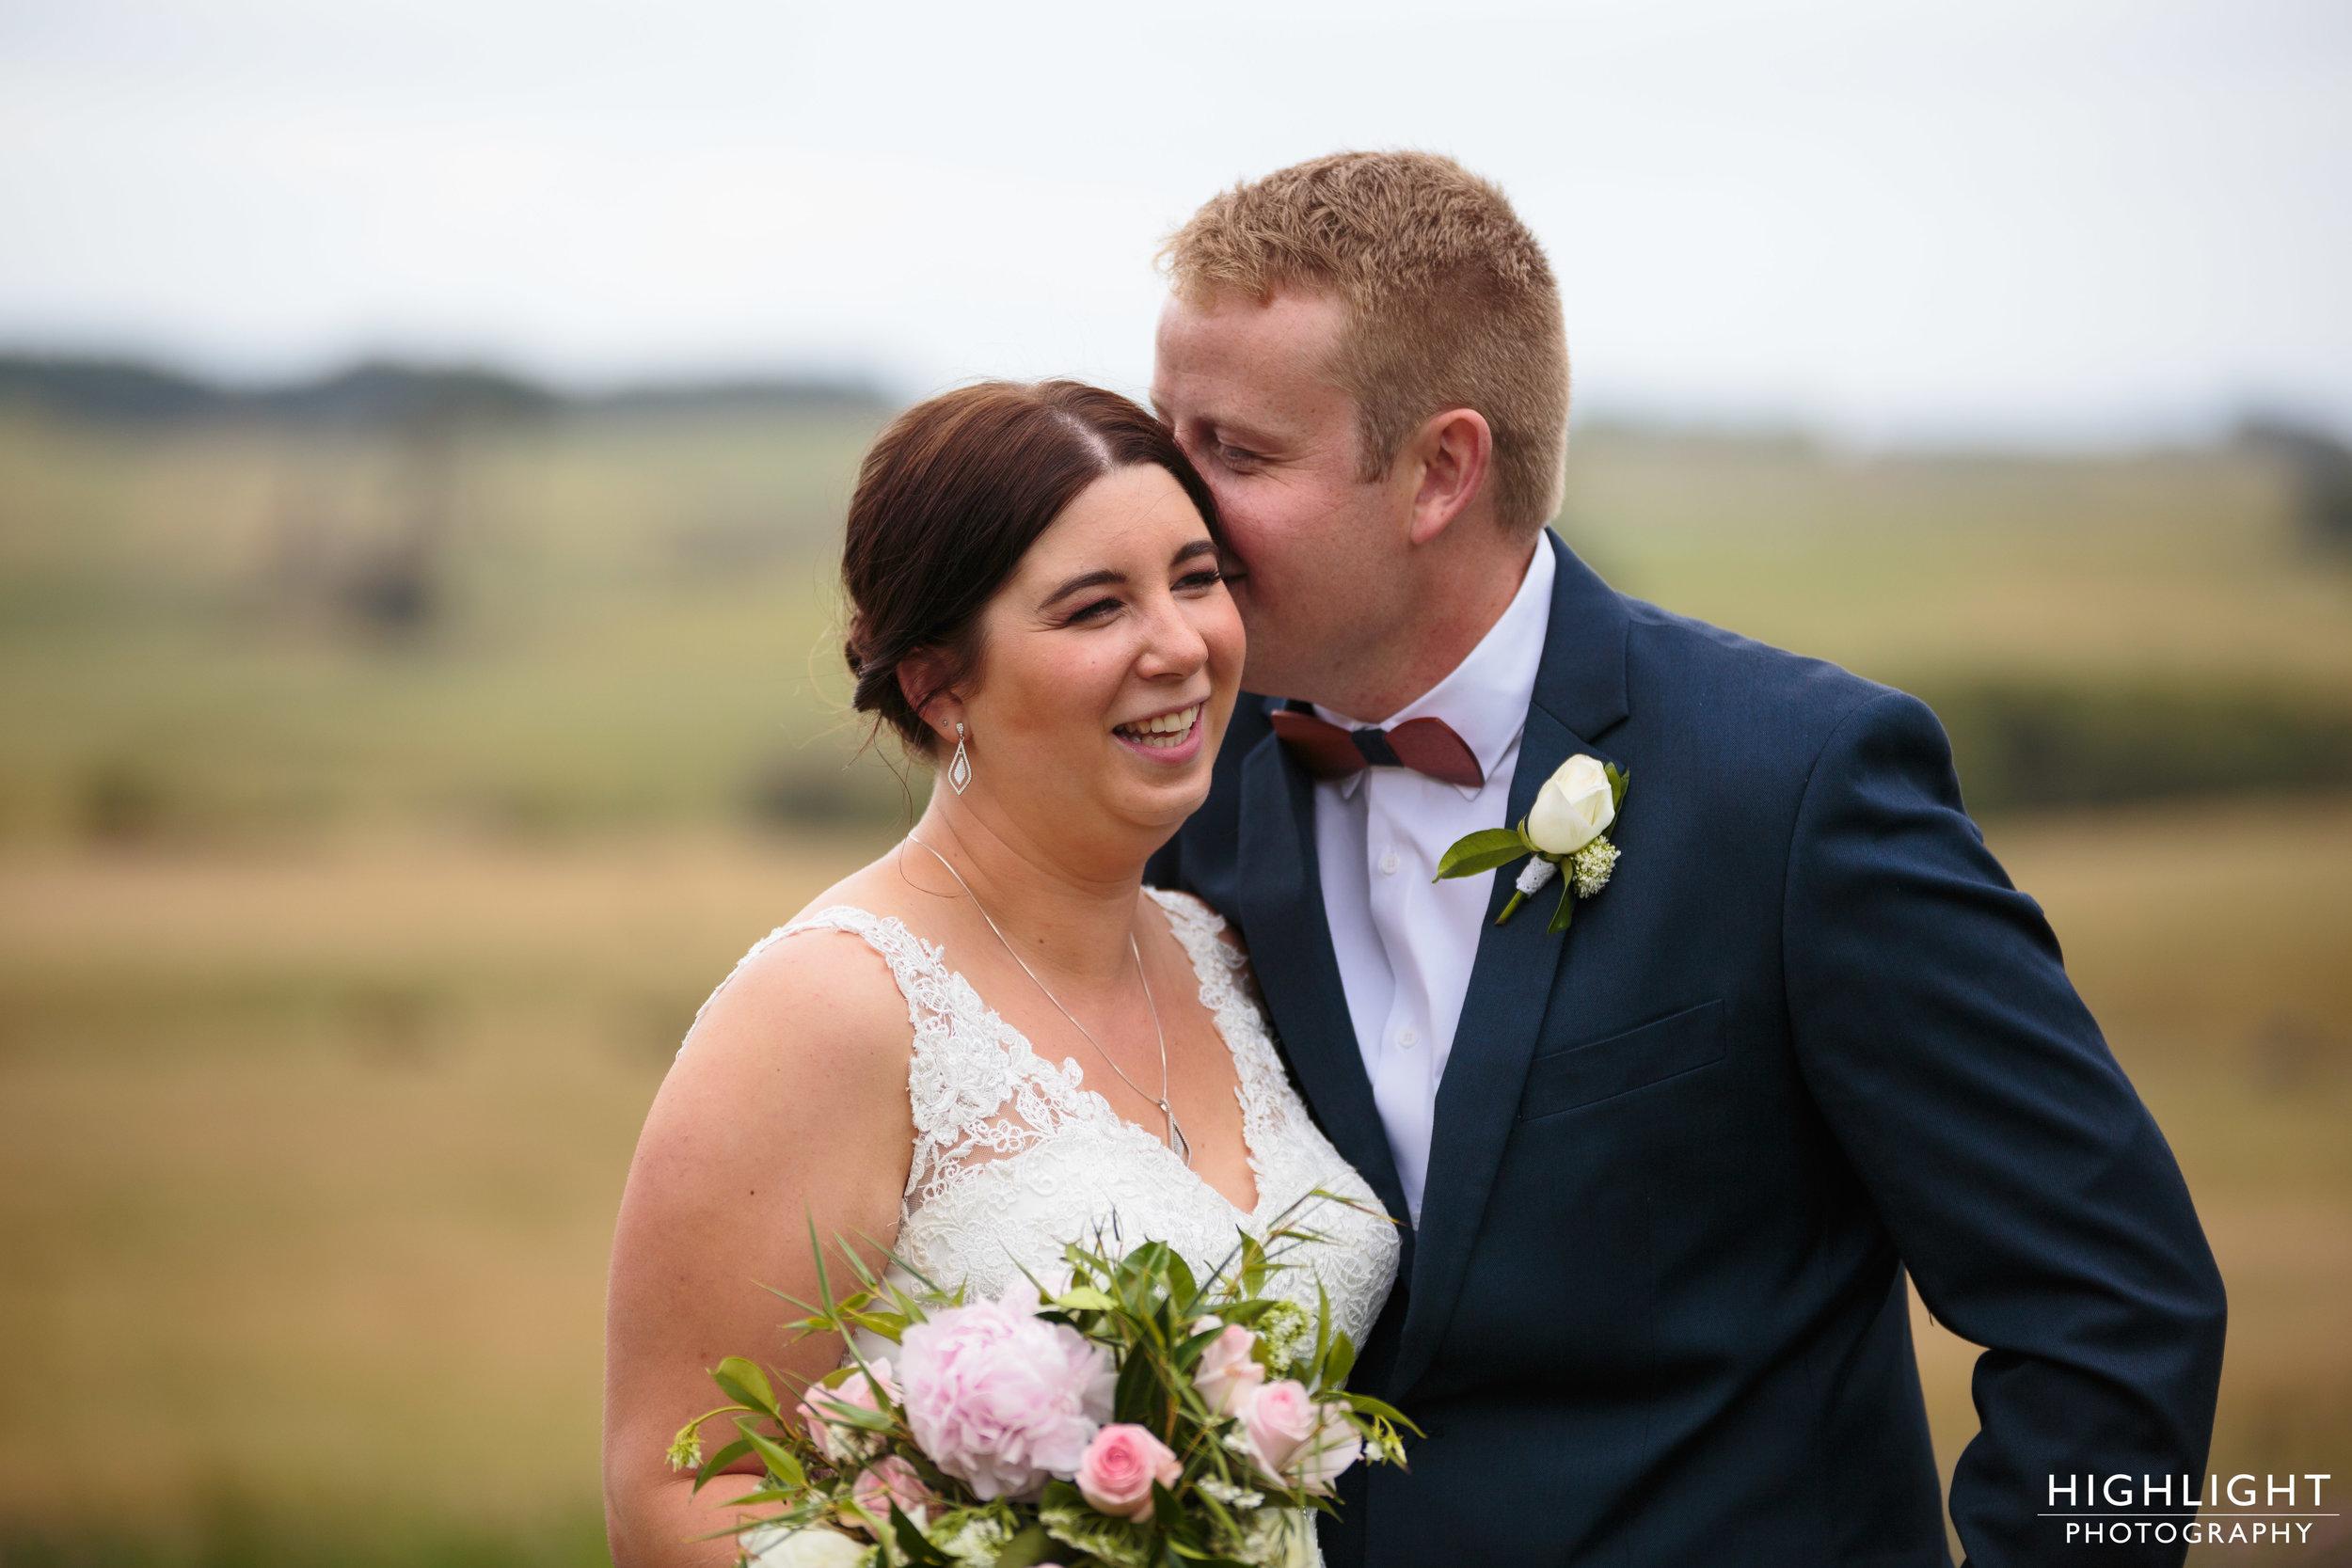 JM-2017-Highlight-wedding-photography-palmerston-north-new-zealand-122.jpg